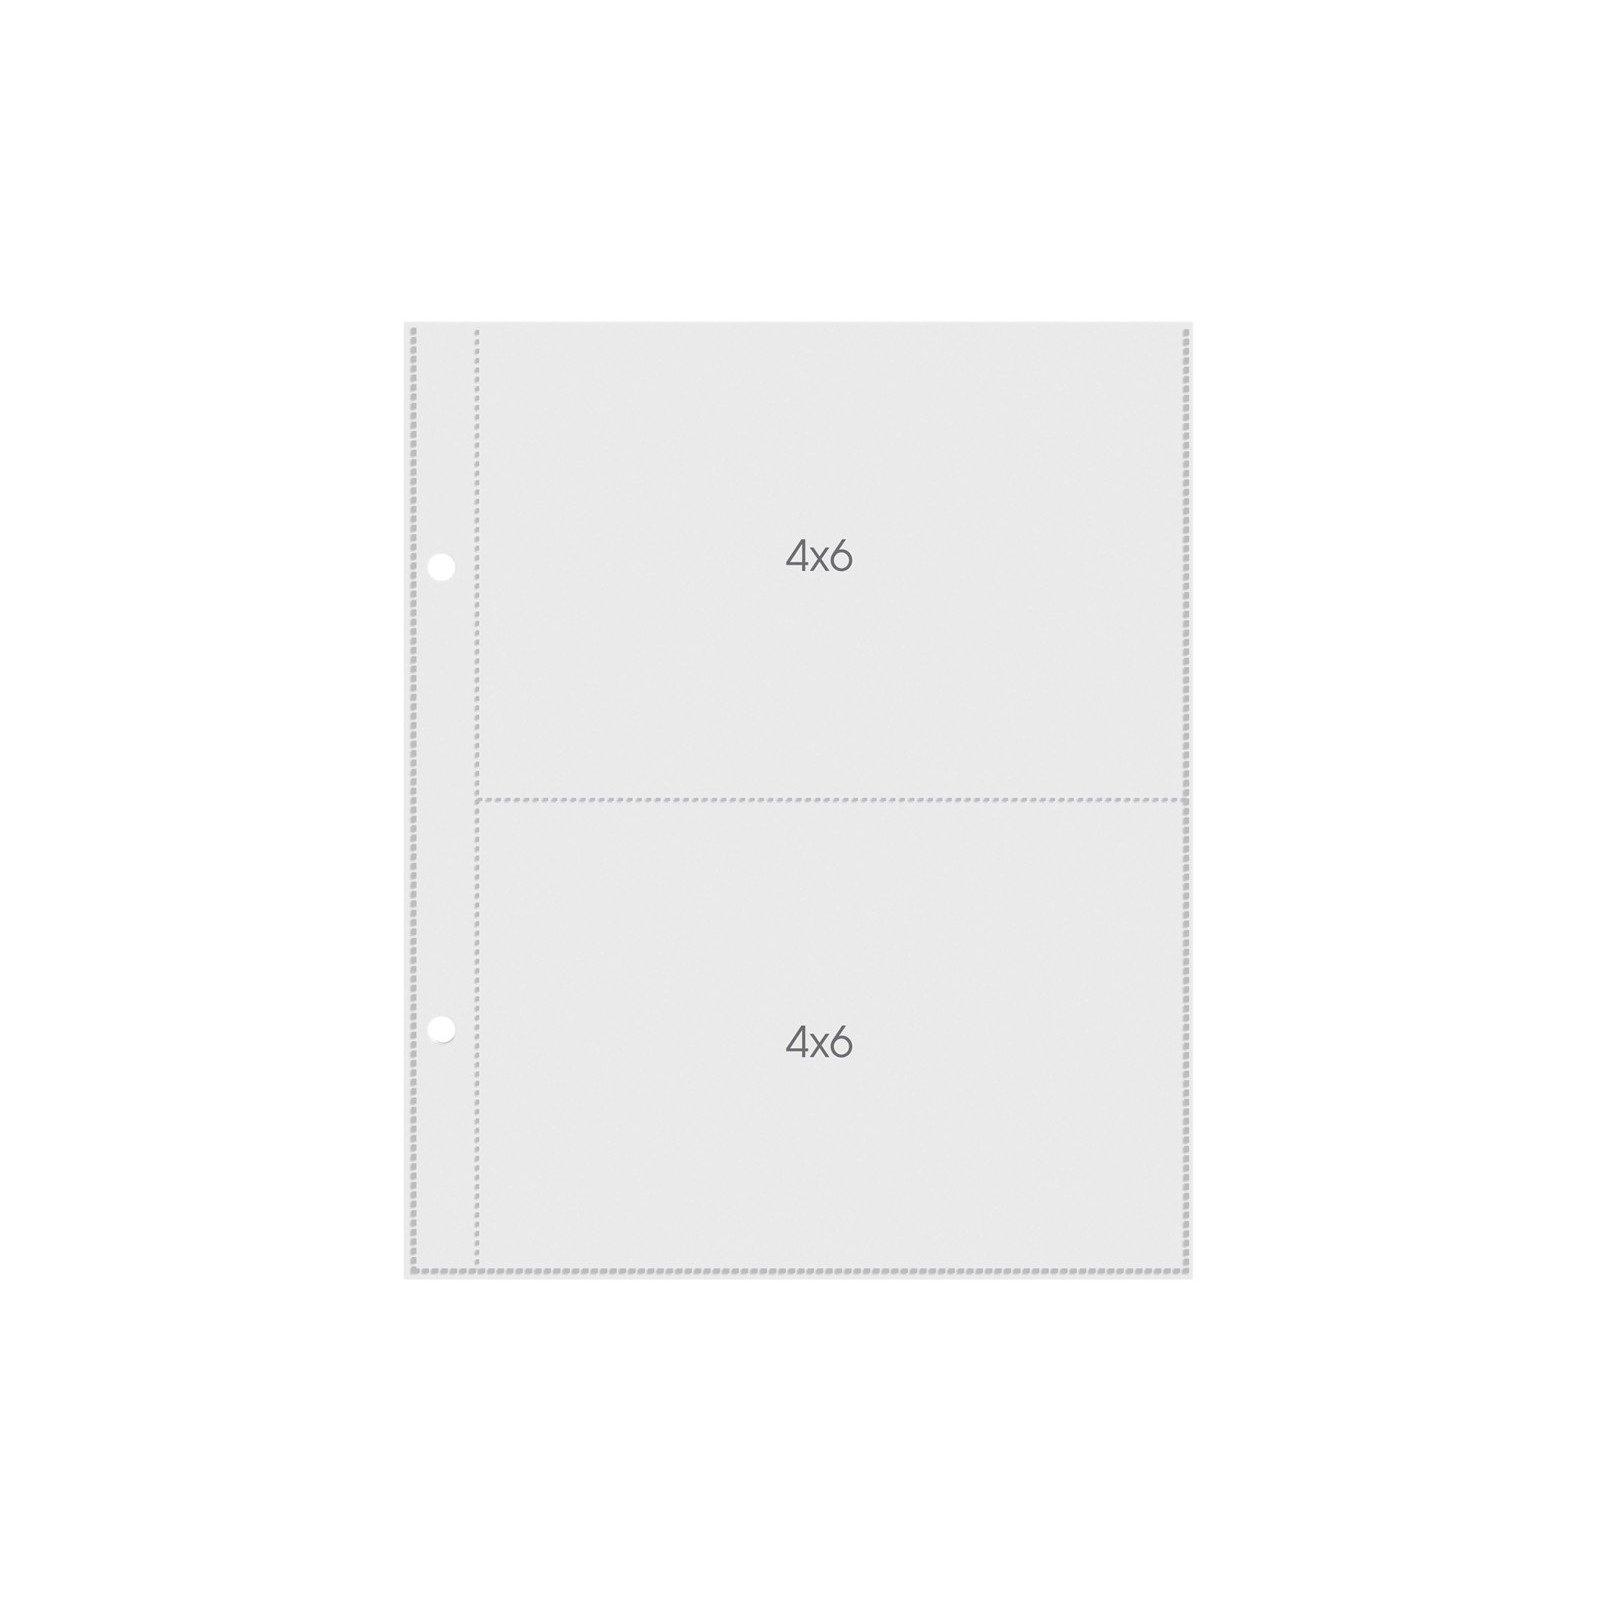 Pochettes Sn@P! Pocket pages 15x20 - 2 compartiments 10x15 - Simple Stories